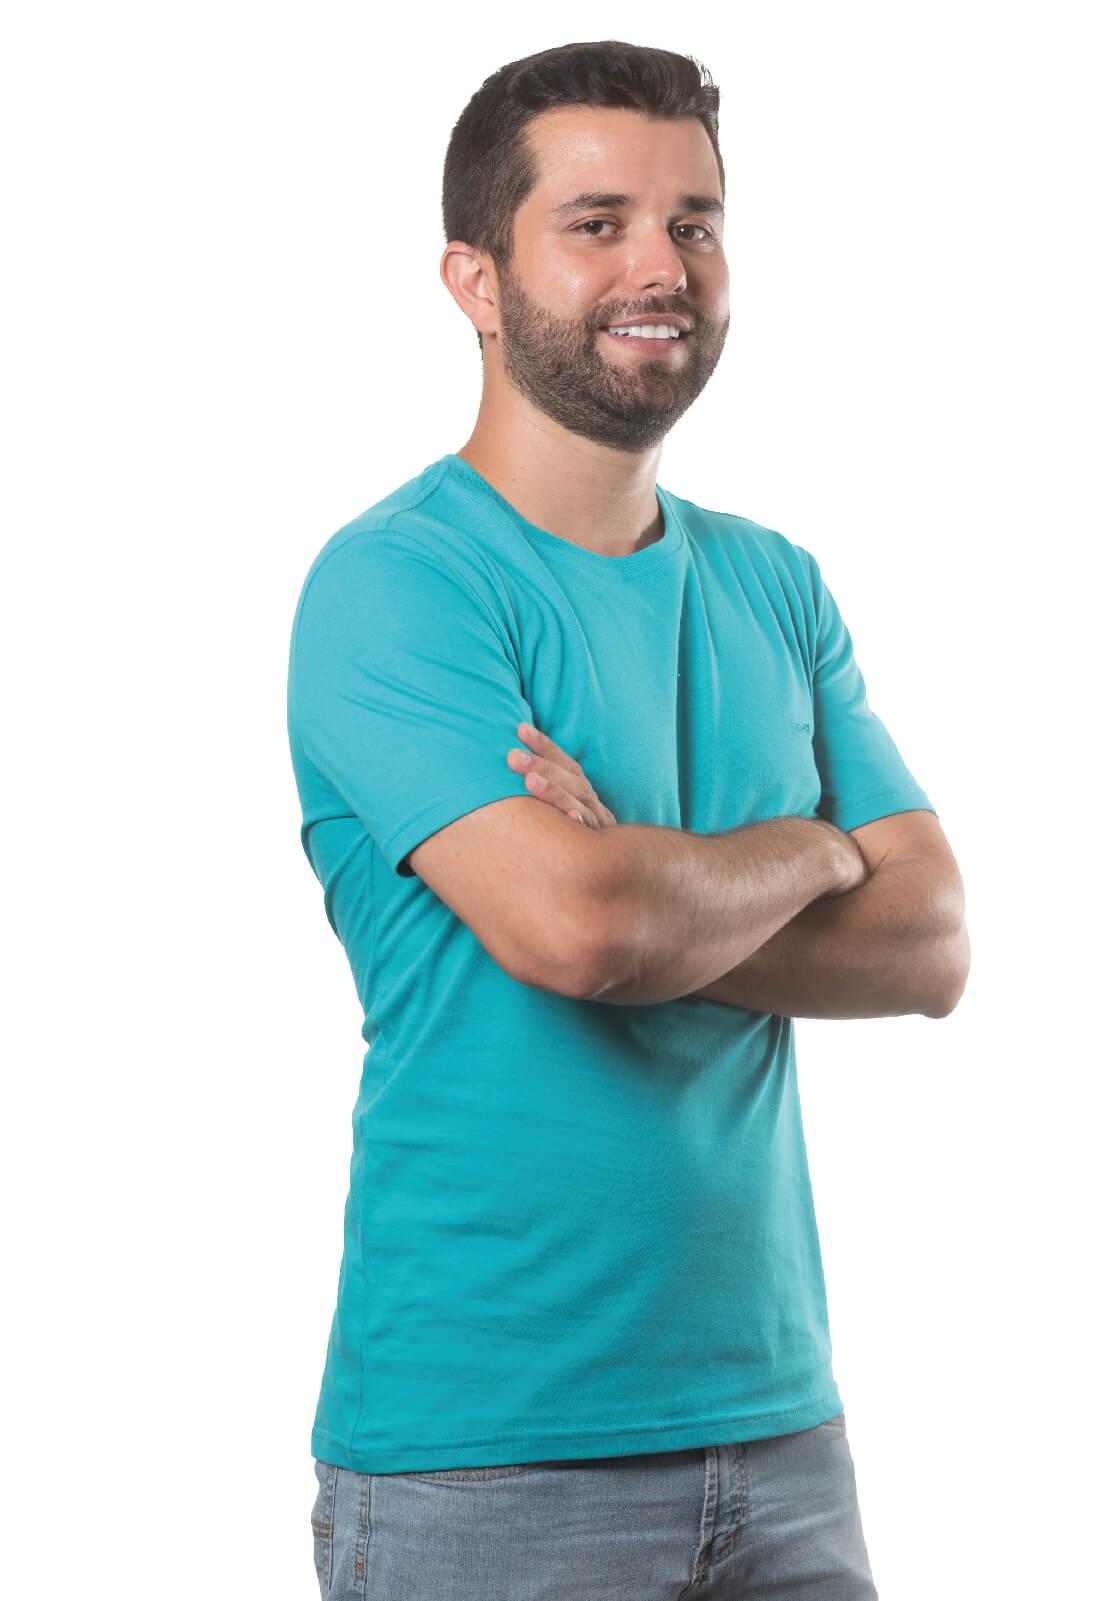 Camiseta Masculina 100% Algodão Super Premium, Na Cor Azul Turquesa